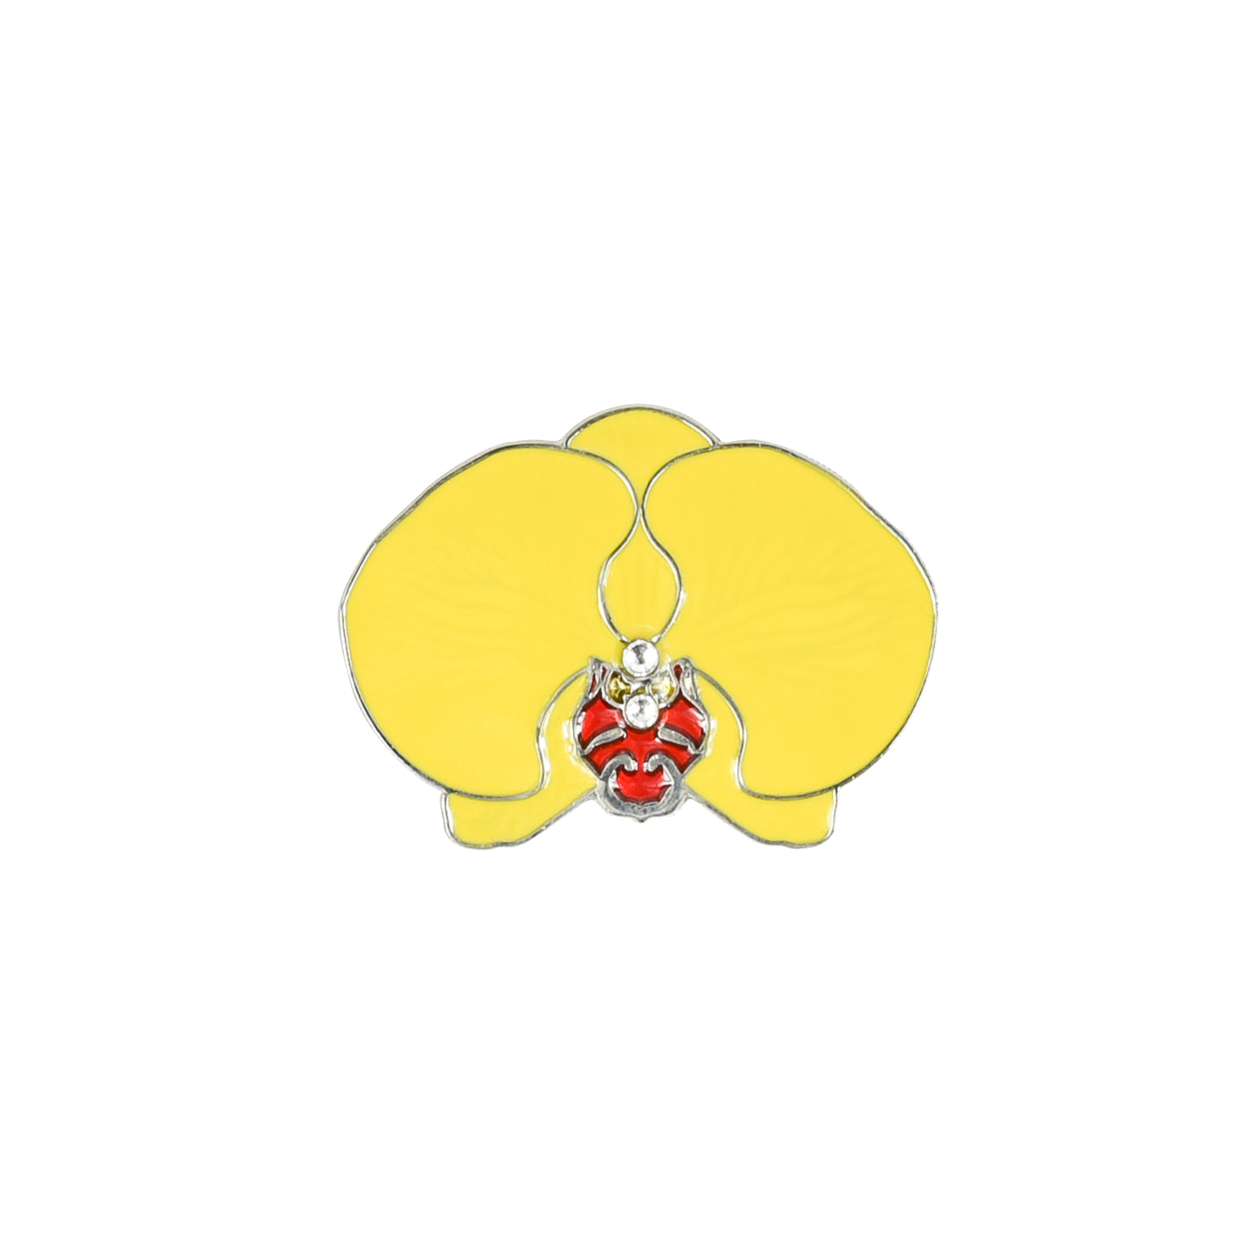 248. Orchid Yellow Divot Tool & Ball Marker Set